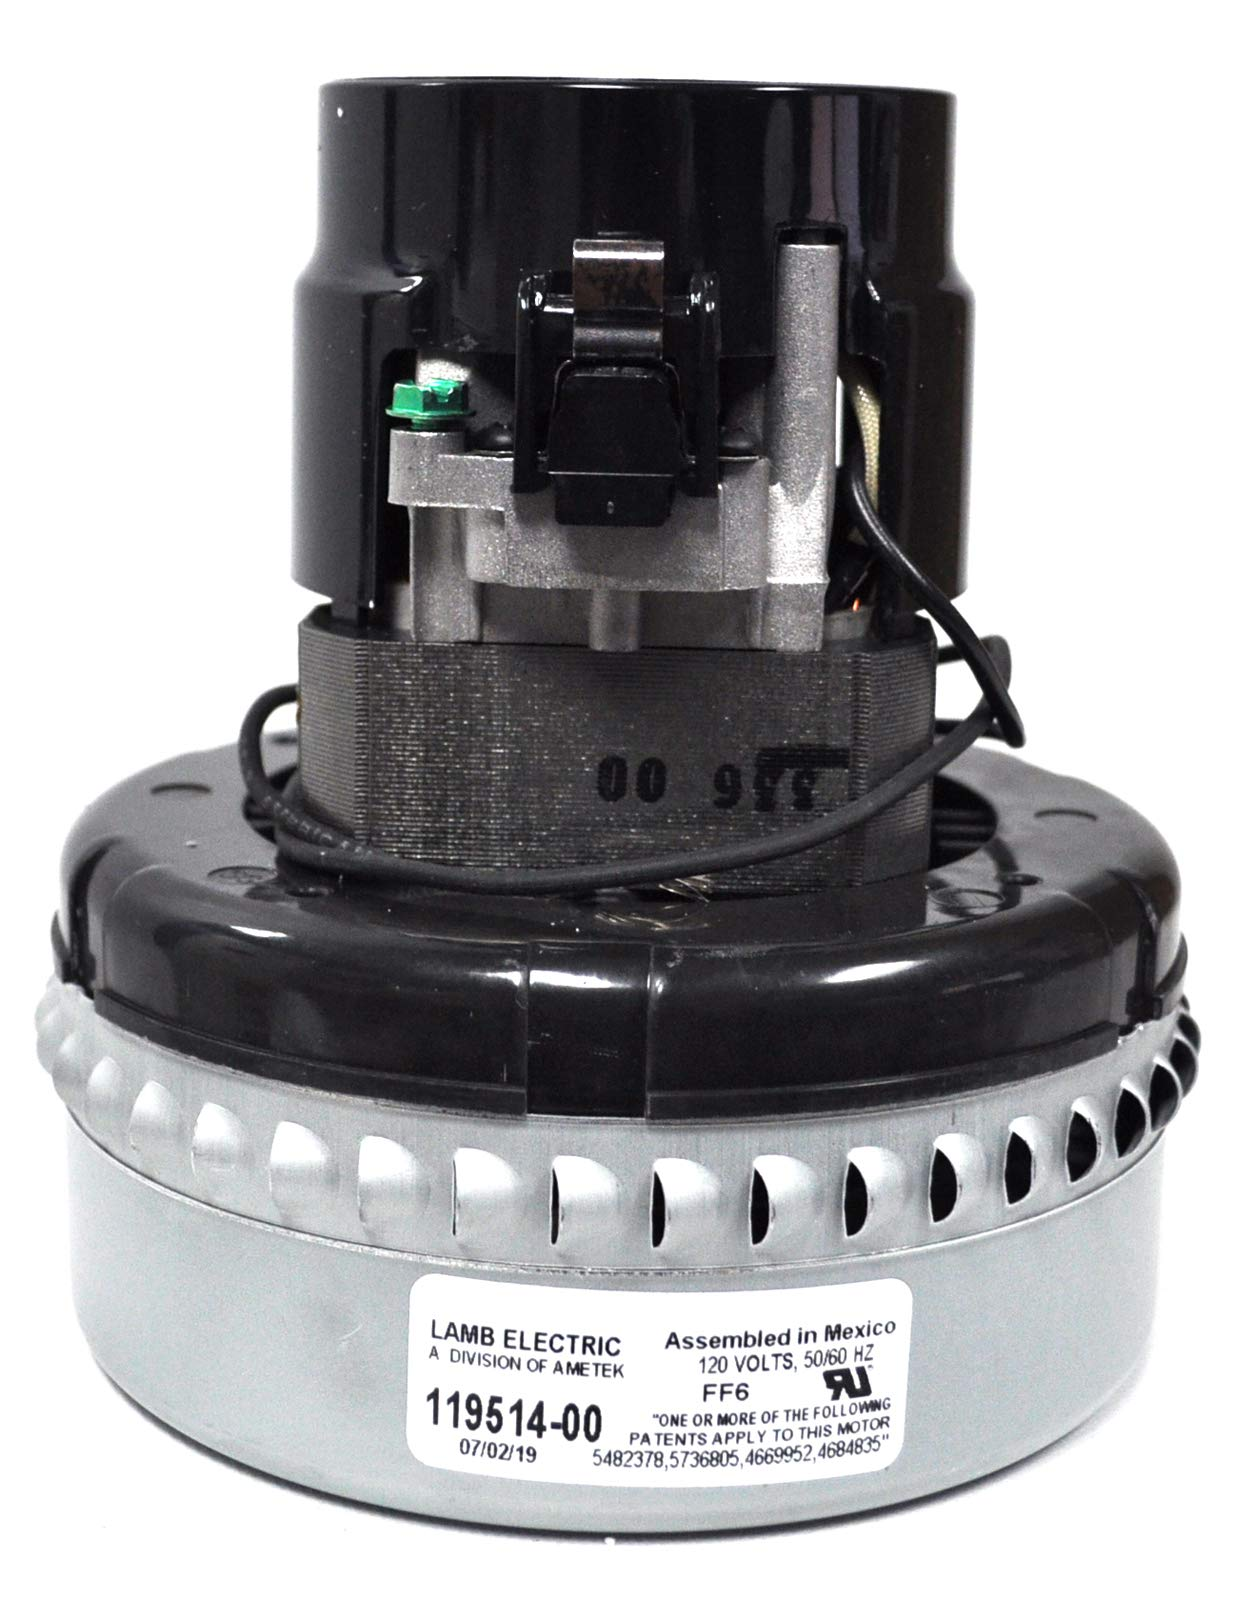 Ametek Lamb 5.7 Inch 2 Stage 120 Volt B/B Peripheral Bypass Motor 119514-00 by Ametek